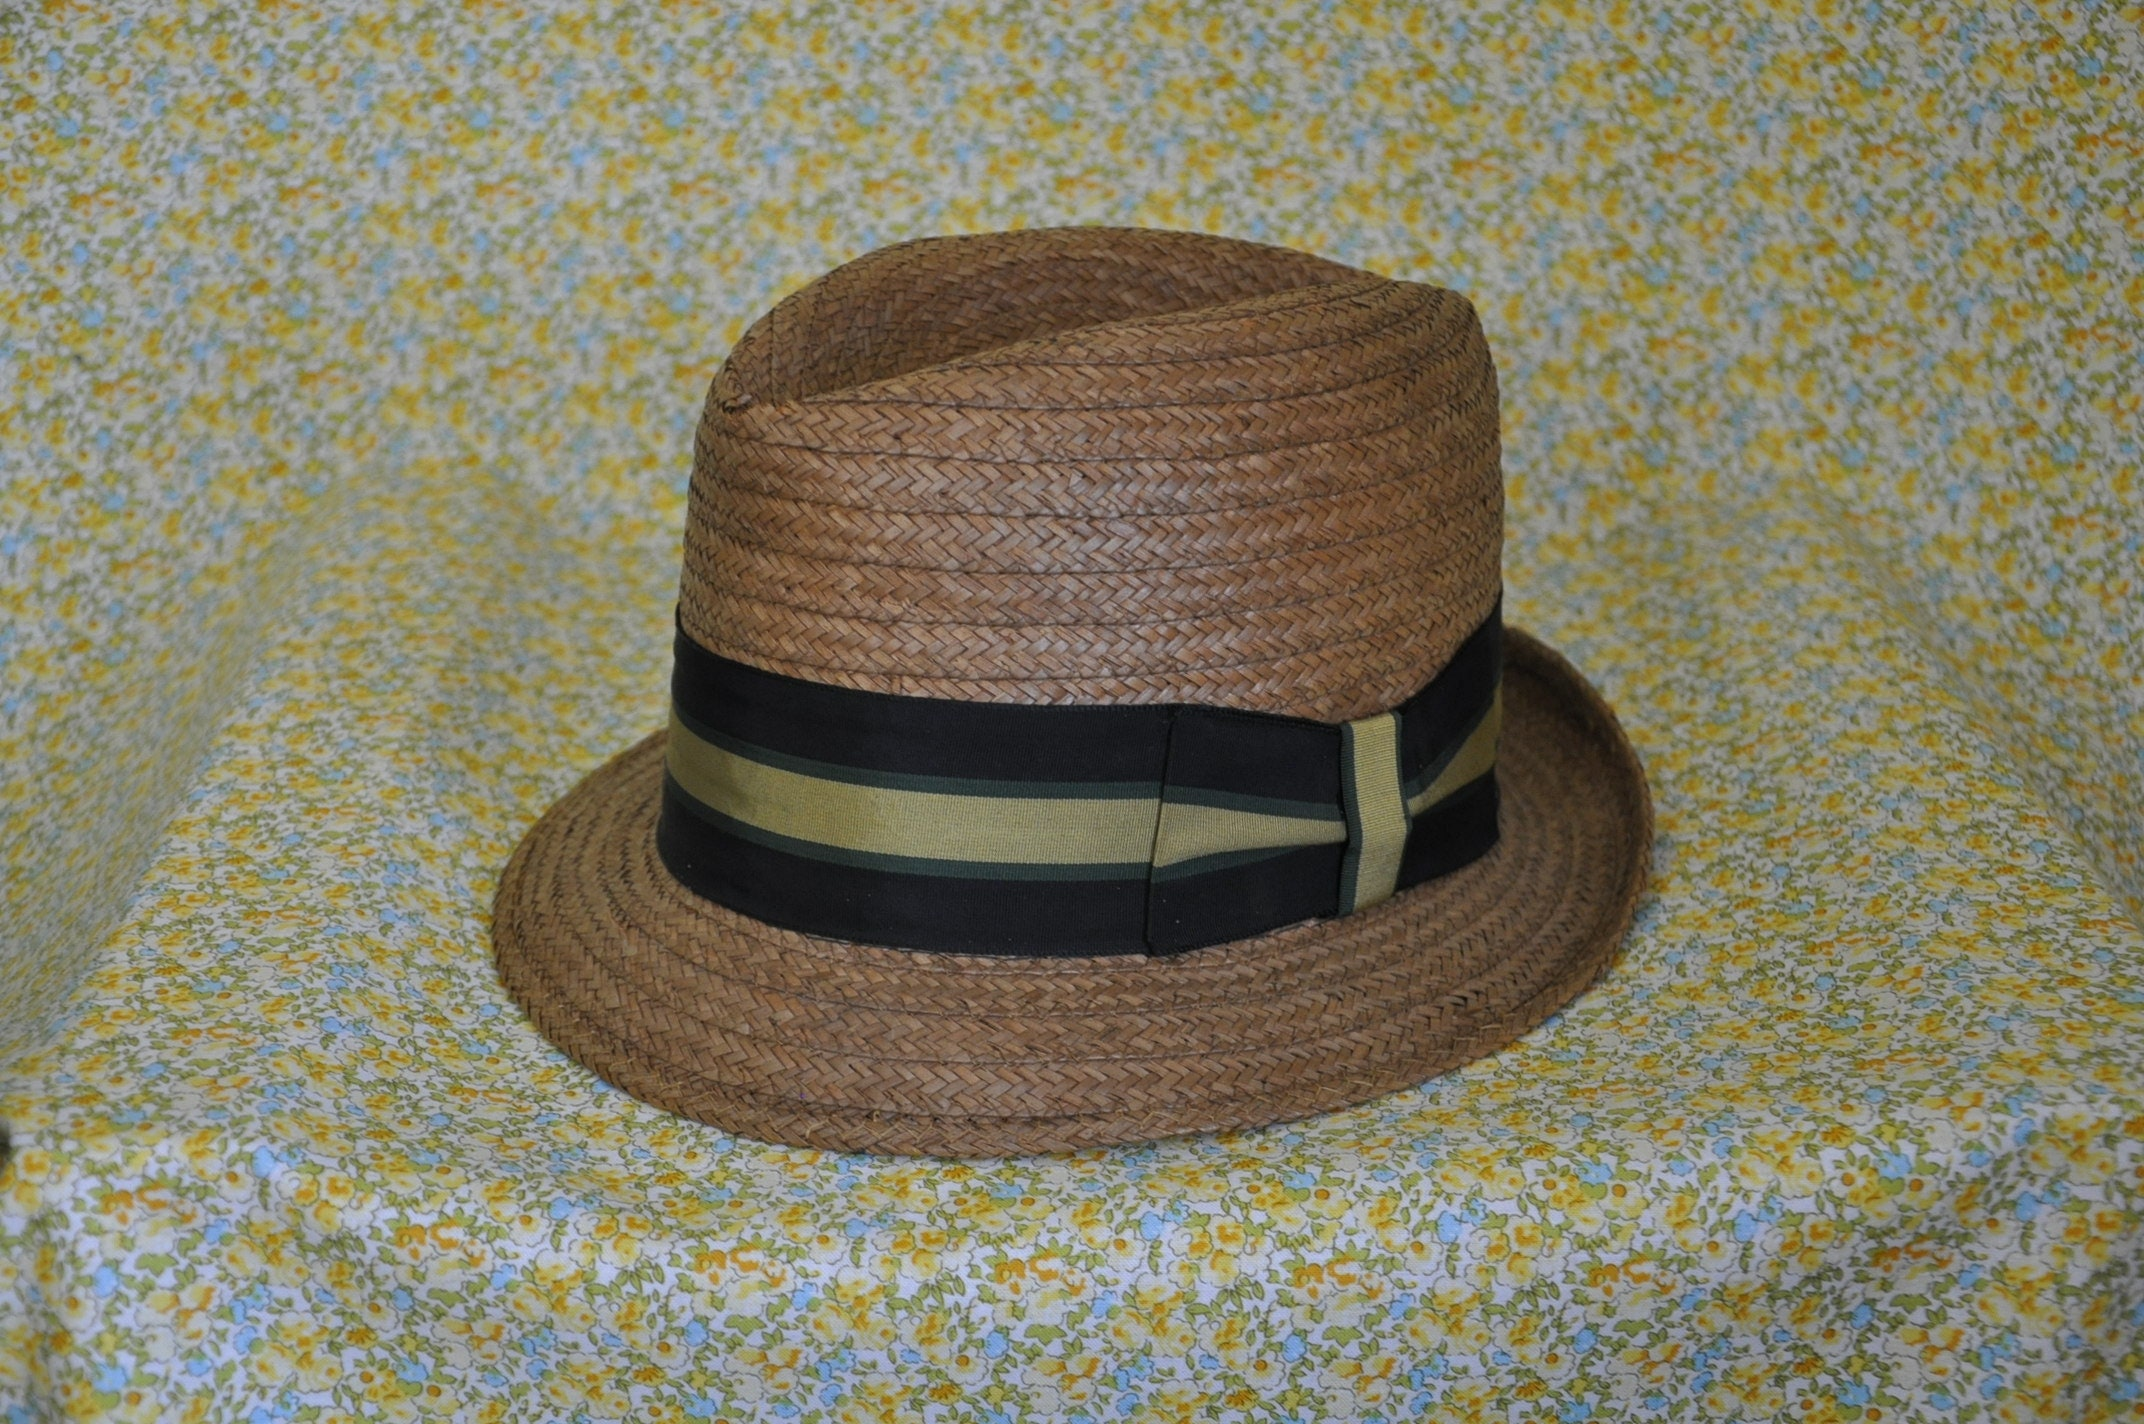 Vintage 1950s Straw Fedora Hat Dobbs Fifth Avenue New York  574cffd71da